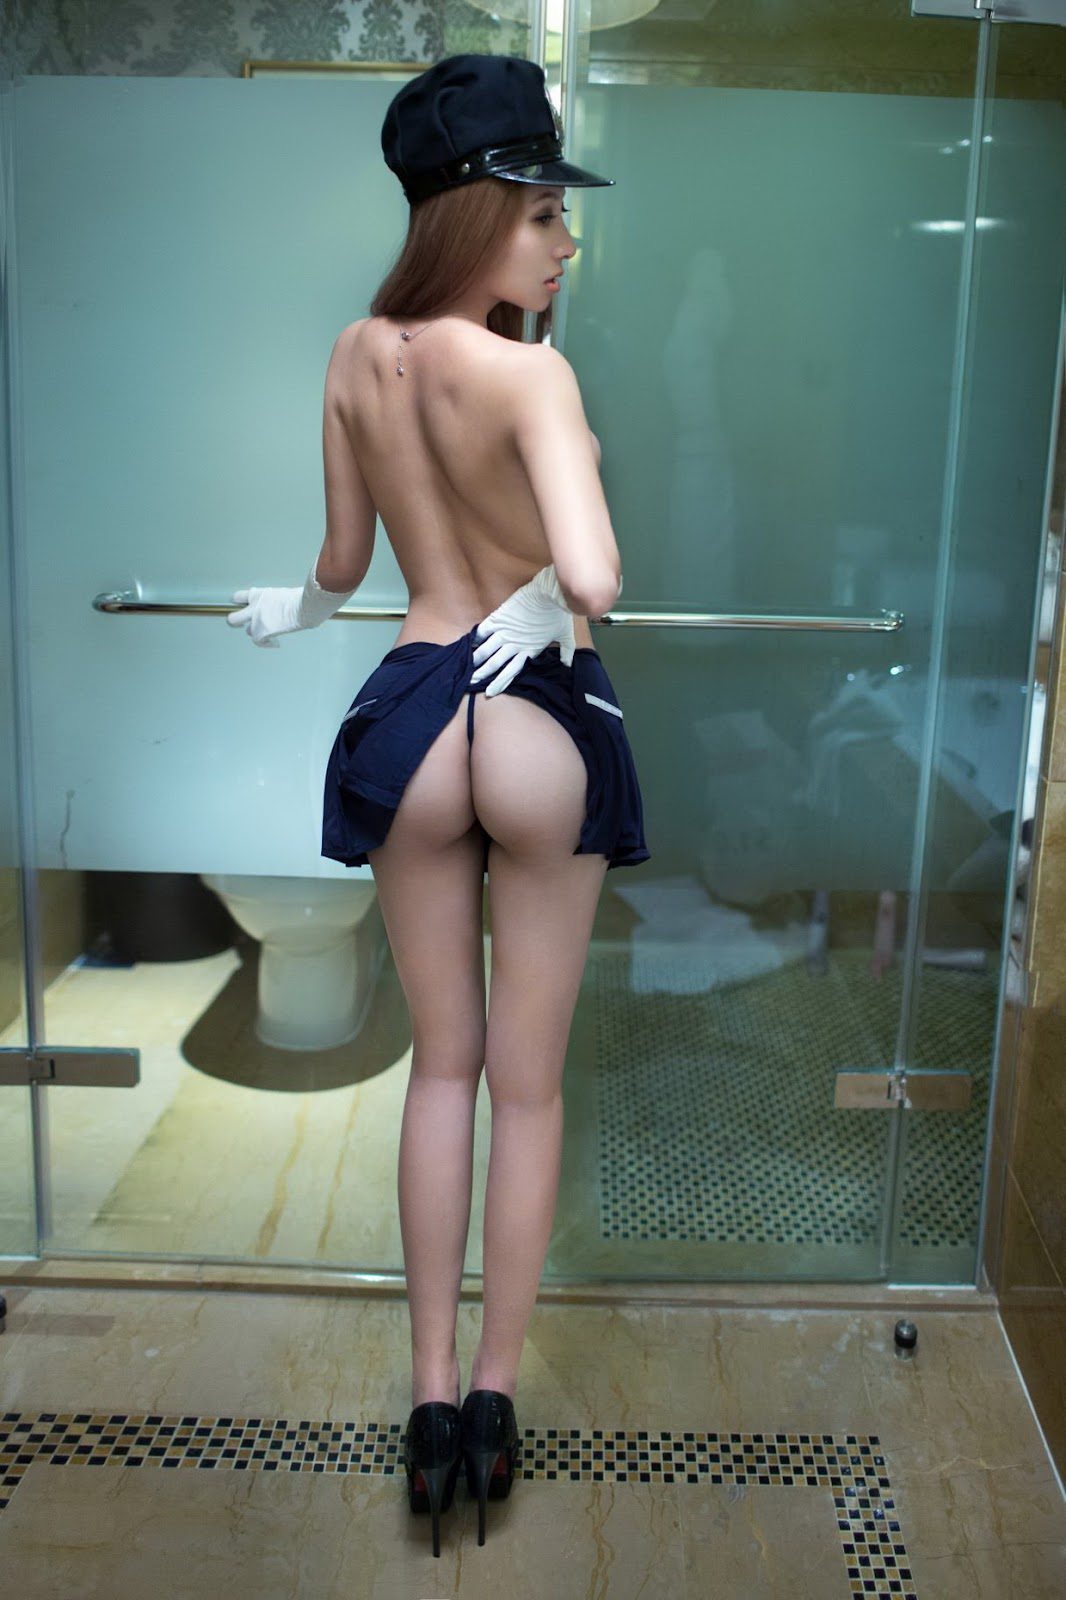 48%2B%252827%2529 - Sexy Girl Nude TUIGIRL NO.48 Model